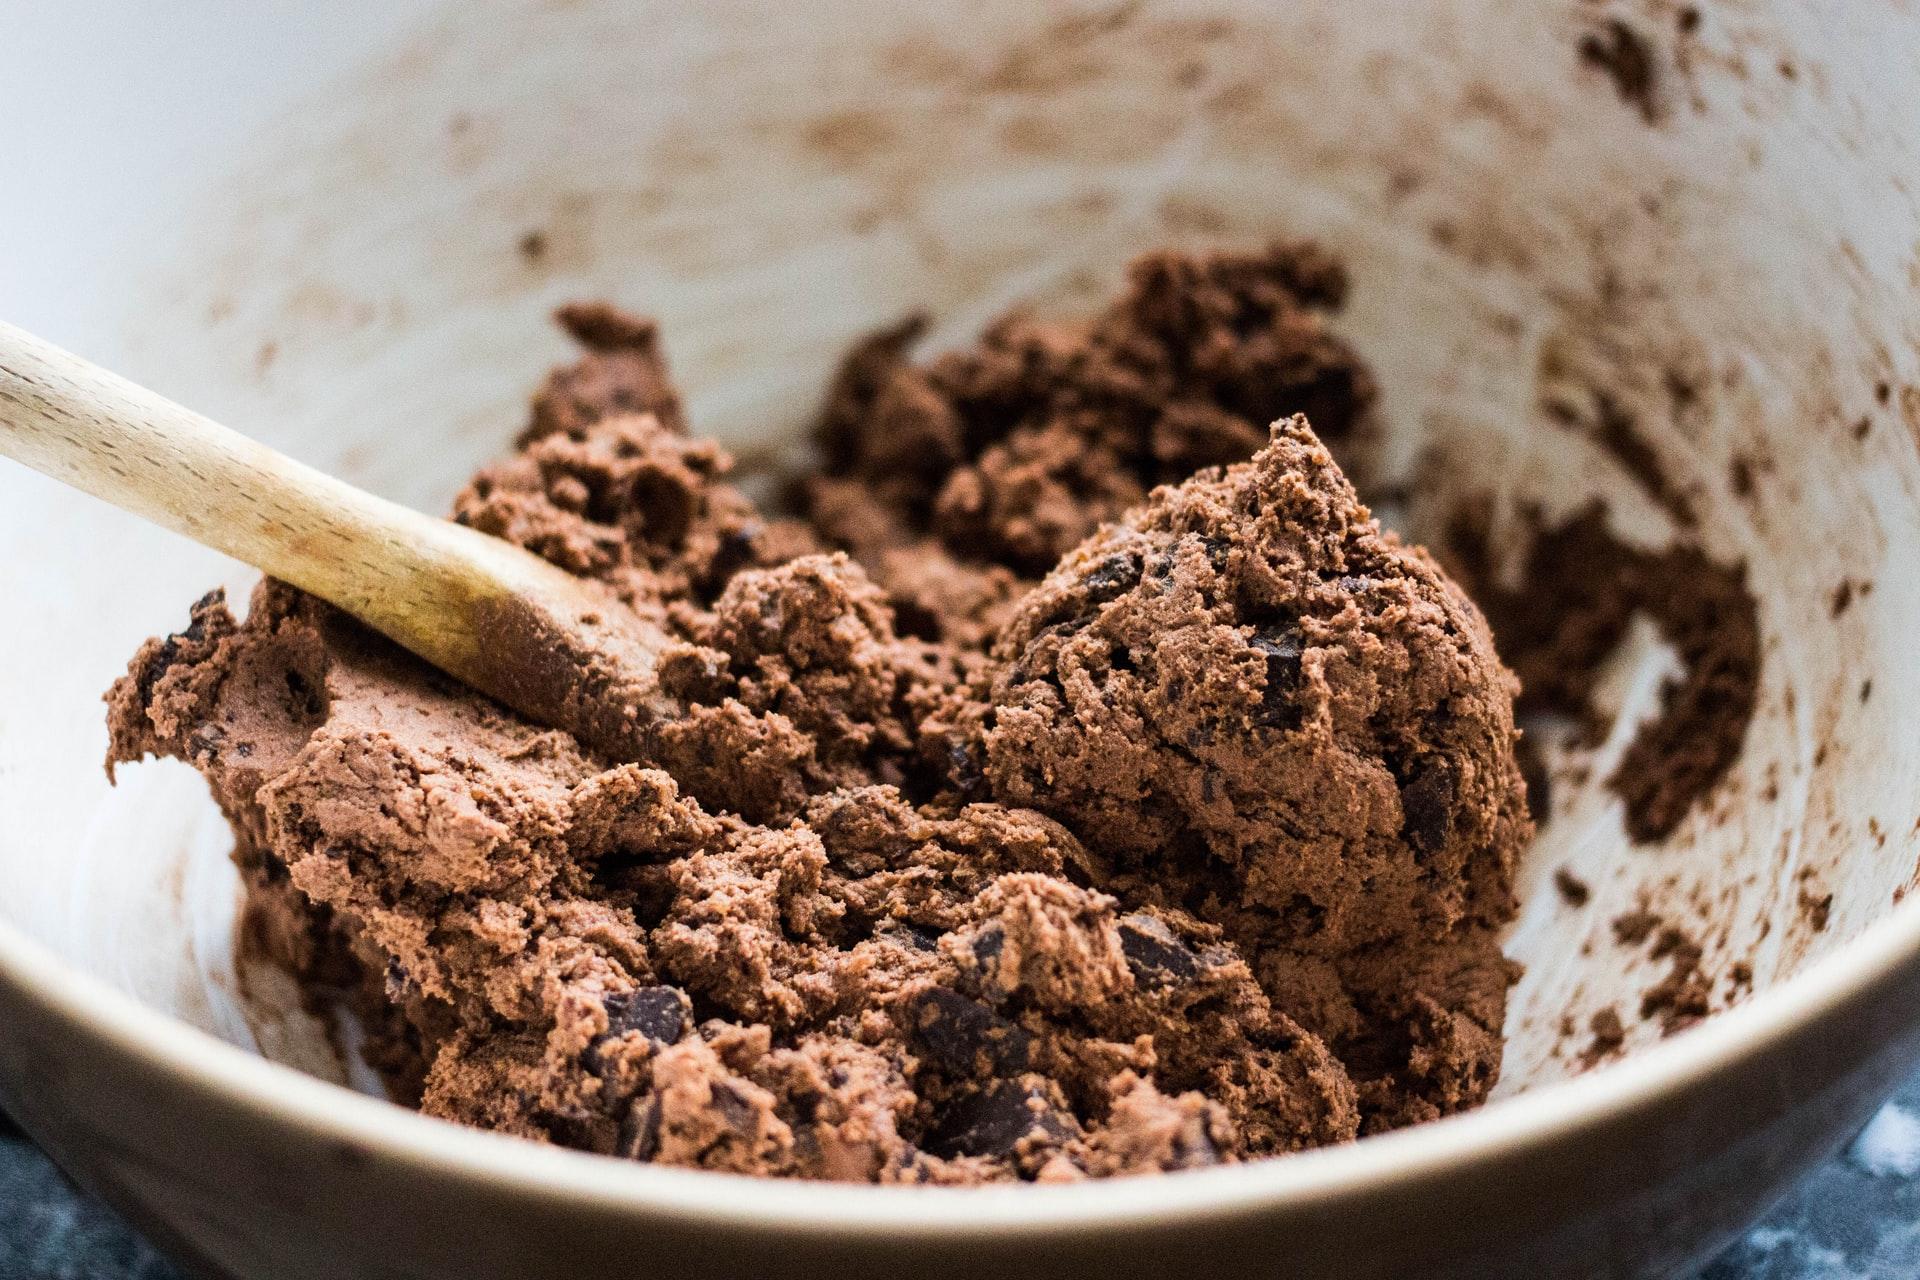 charisse kenion vFMJNZz3x9E unsplash 1 - Sladká bleskovka - recept na vegánske čoko cookies